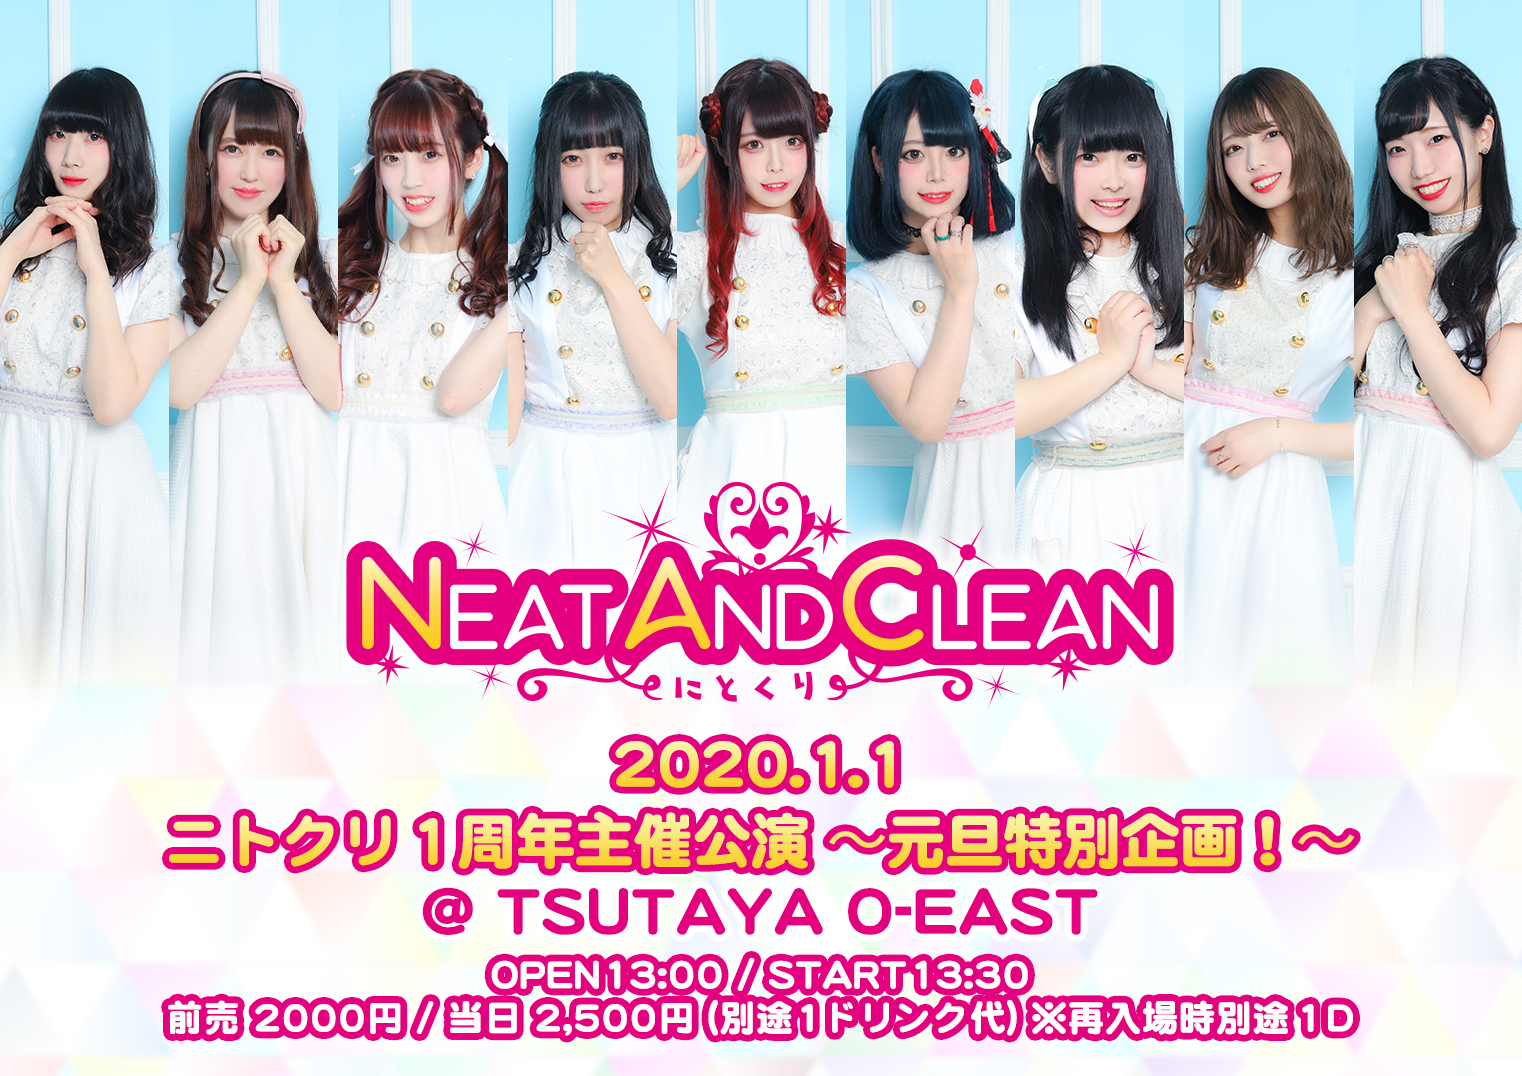 『 Neat and clean-ニトクリ- 1周年記念公演~元旦特別企画!~@ TSUTAYA O-EAST 』